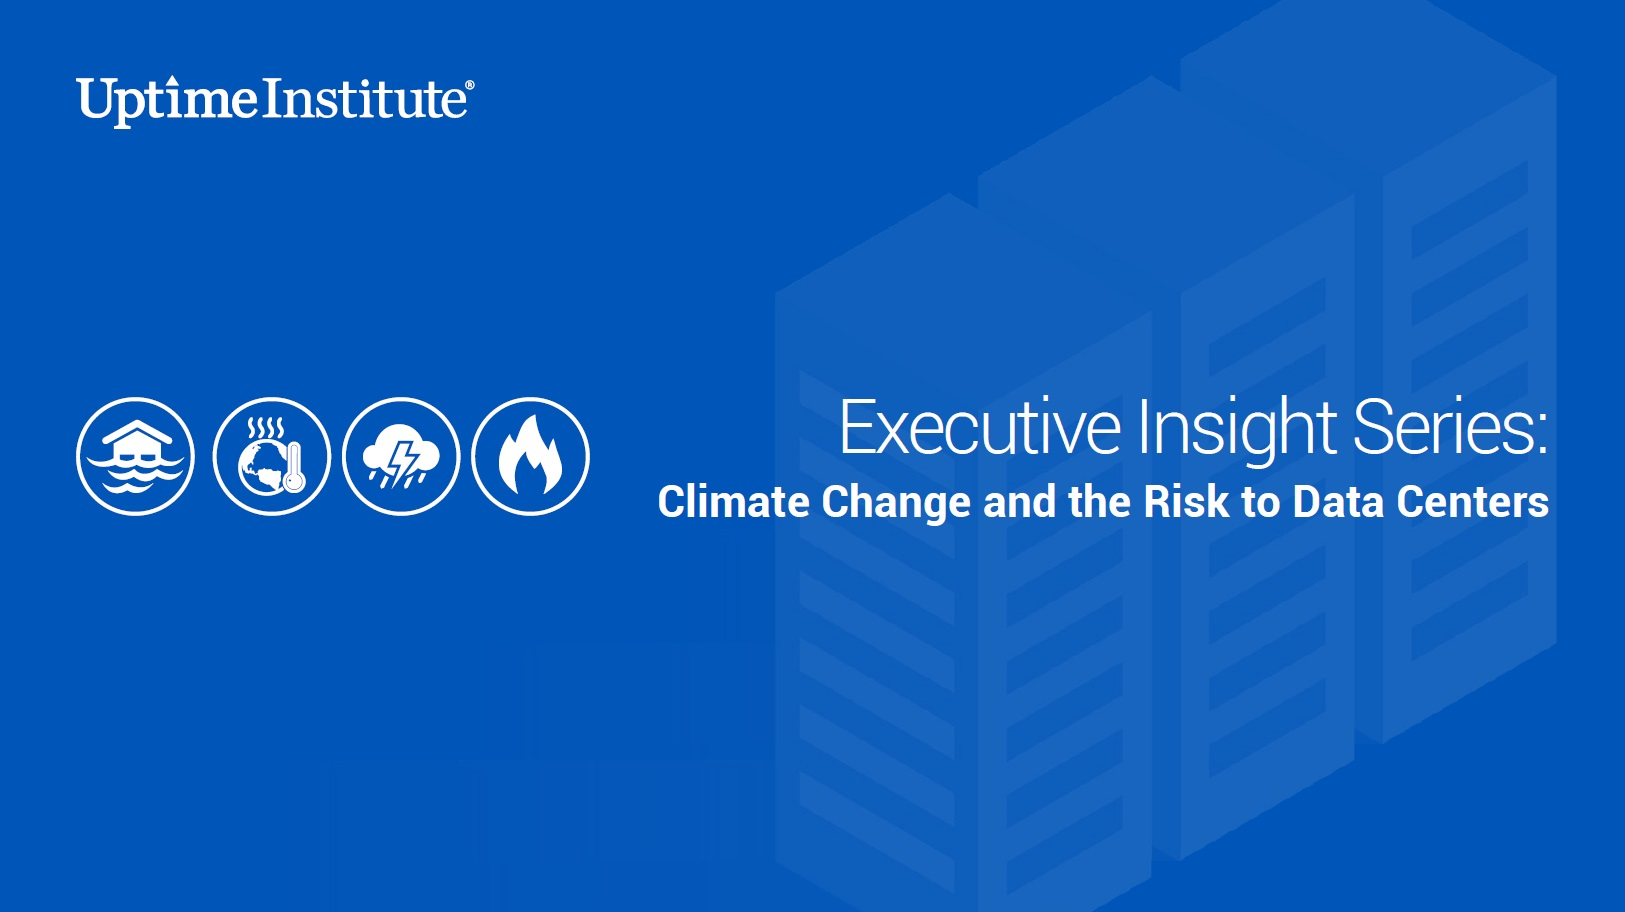 ui_executiveinsights_climatechangerisktodatacenters.jpg